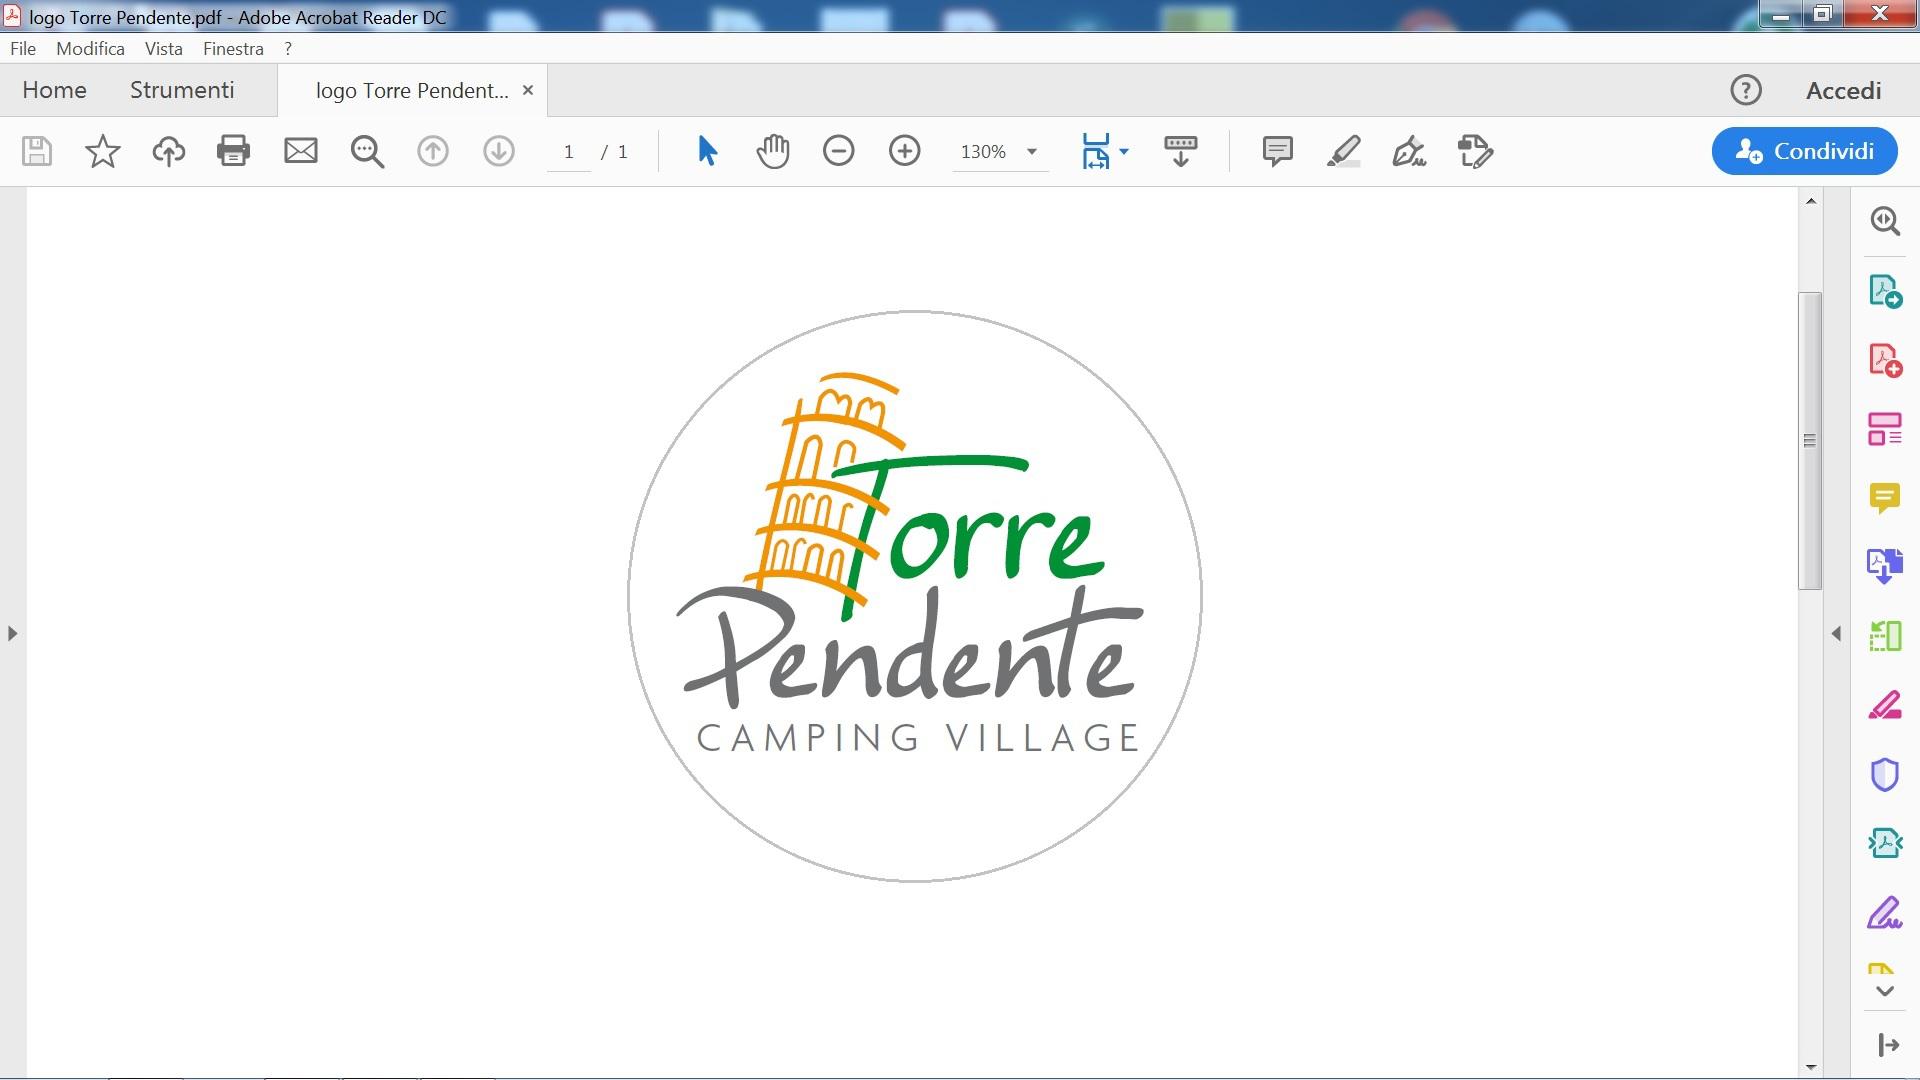 Torre Pendente Camping Village - Pisa